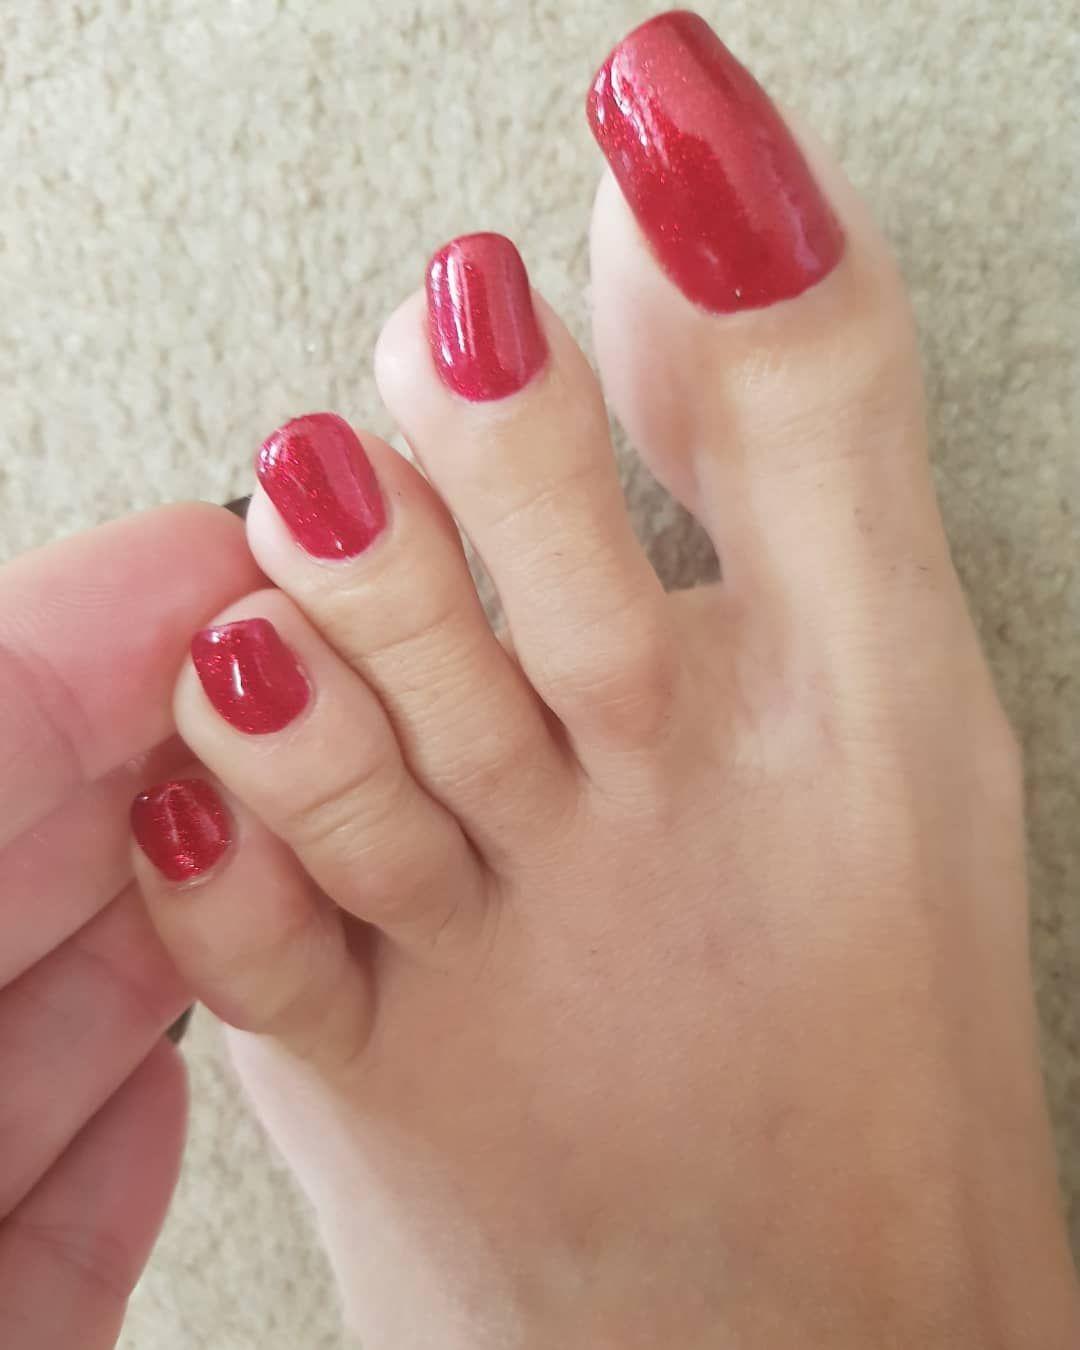 Toestuesday #longtoea #longtoenails #ukfeet tout But De Foot Pour Jardin